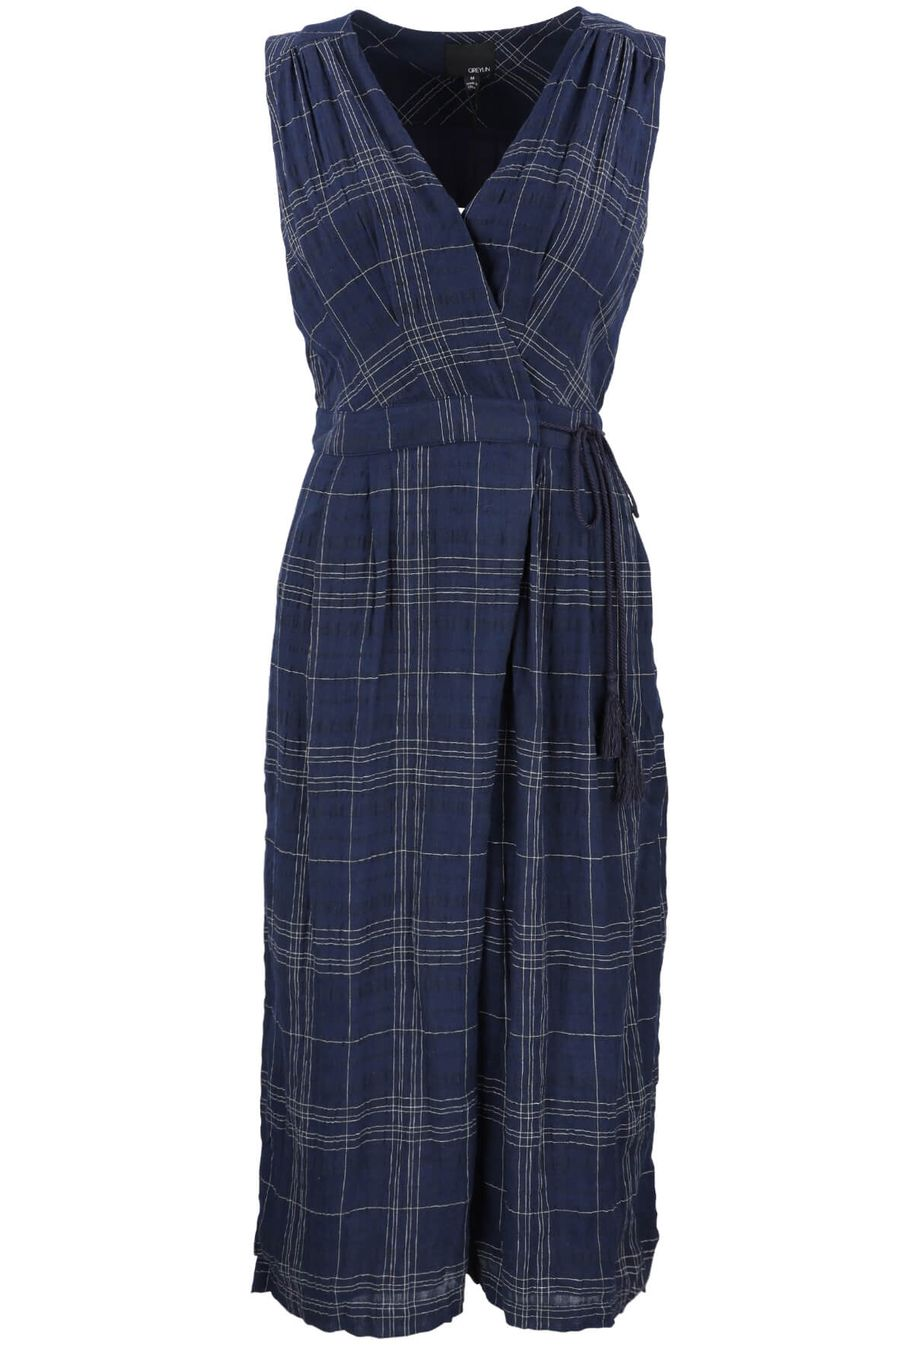 greylin-haven-culotte-jumpsuit-1